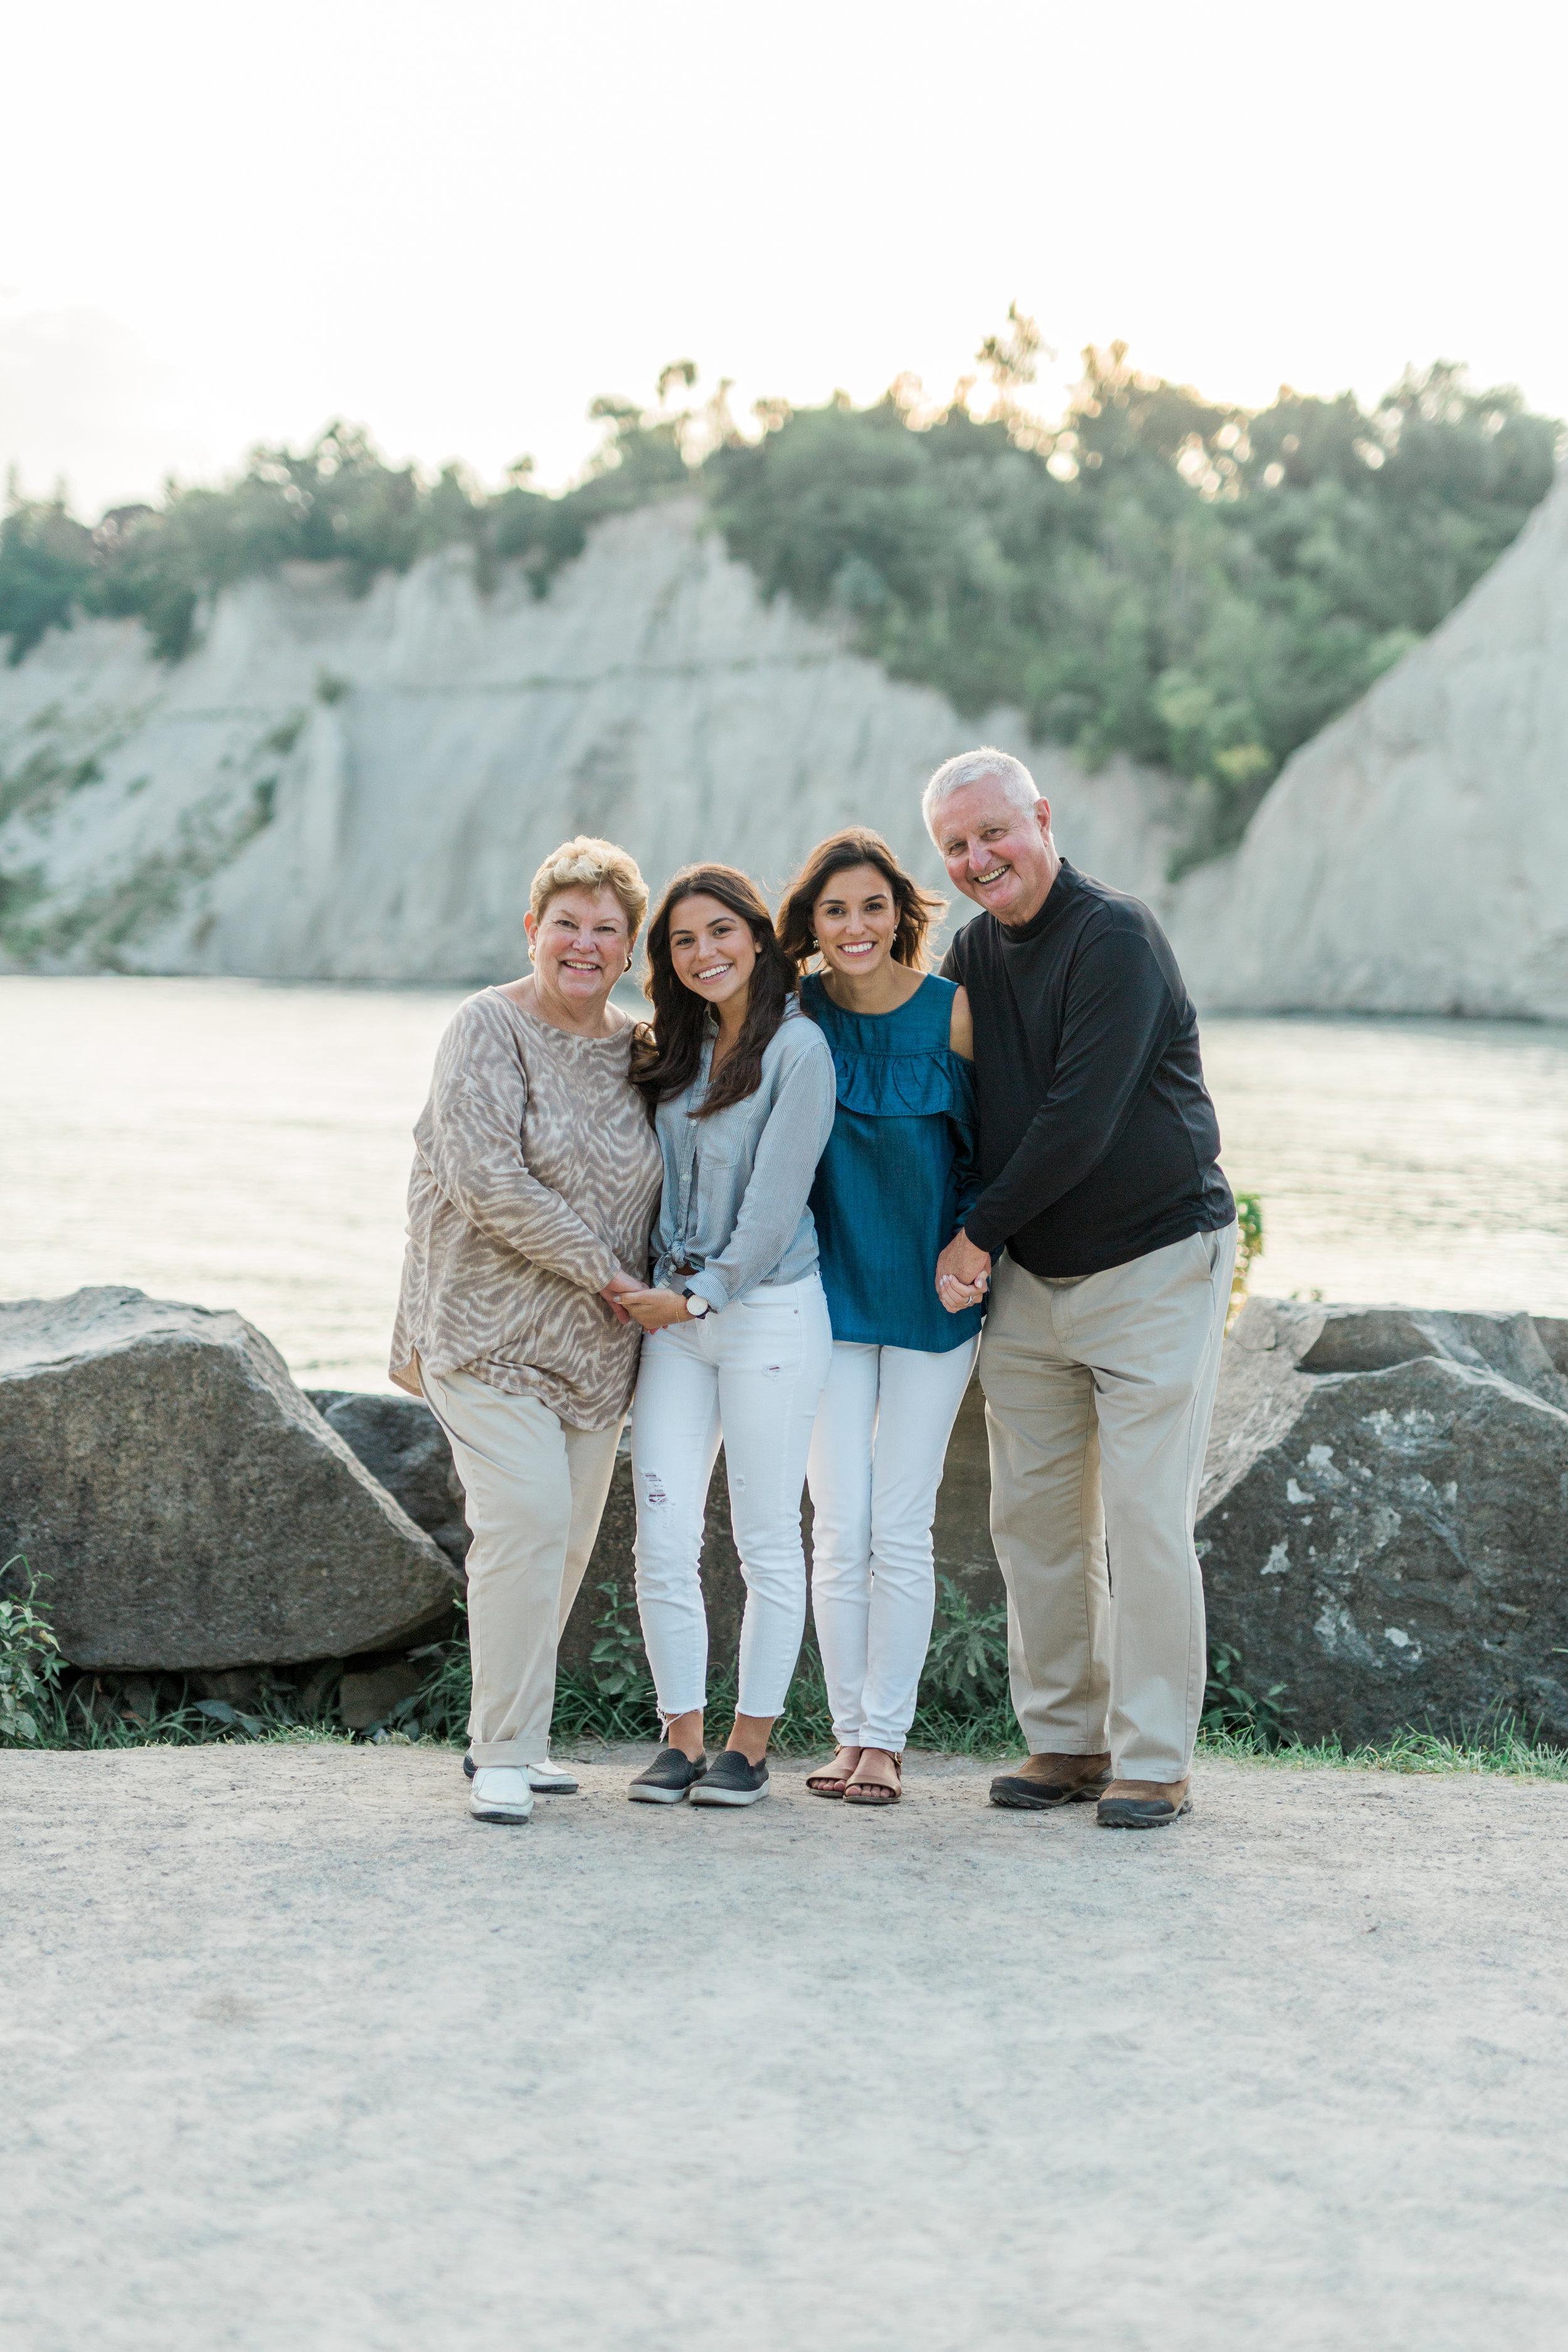 Danielle-Giroux-Amir-Golbazi-Genua-Family-Photography-Scarborough-Bluffs-9439.jpg